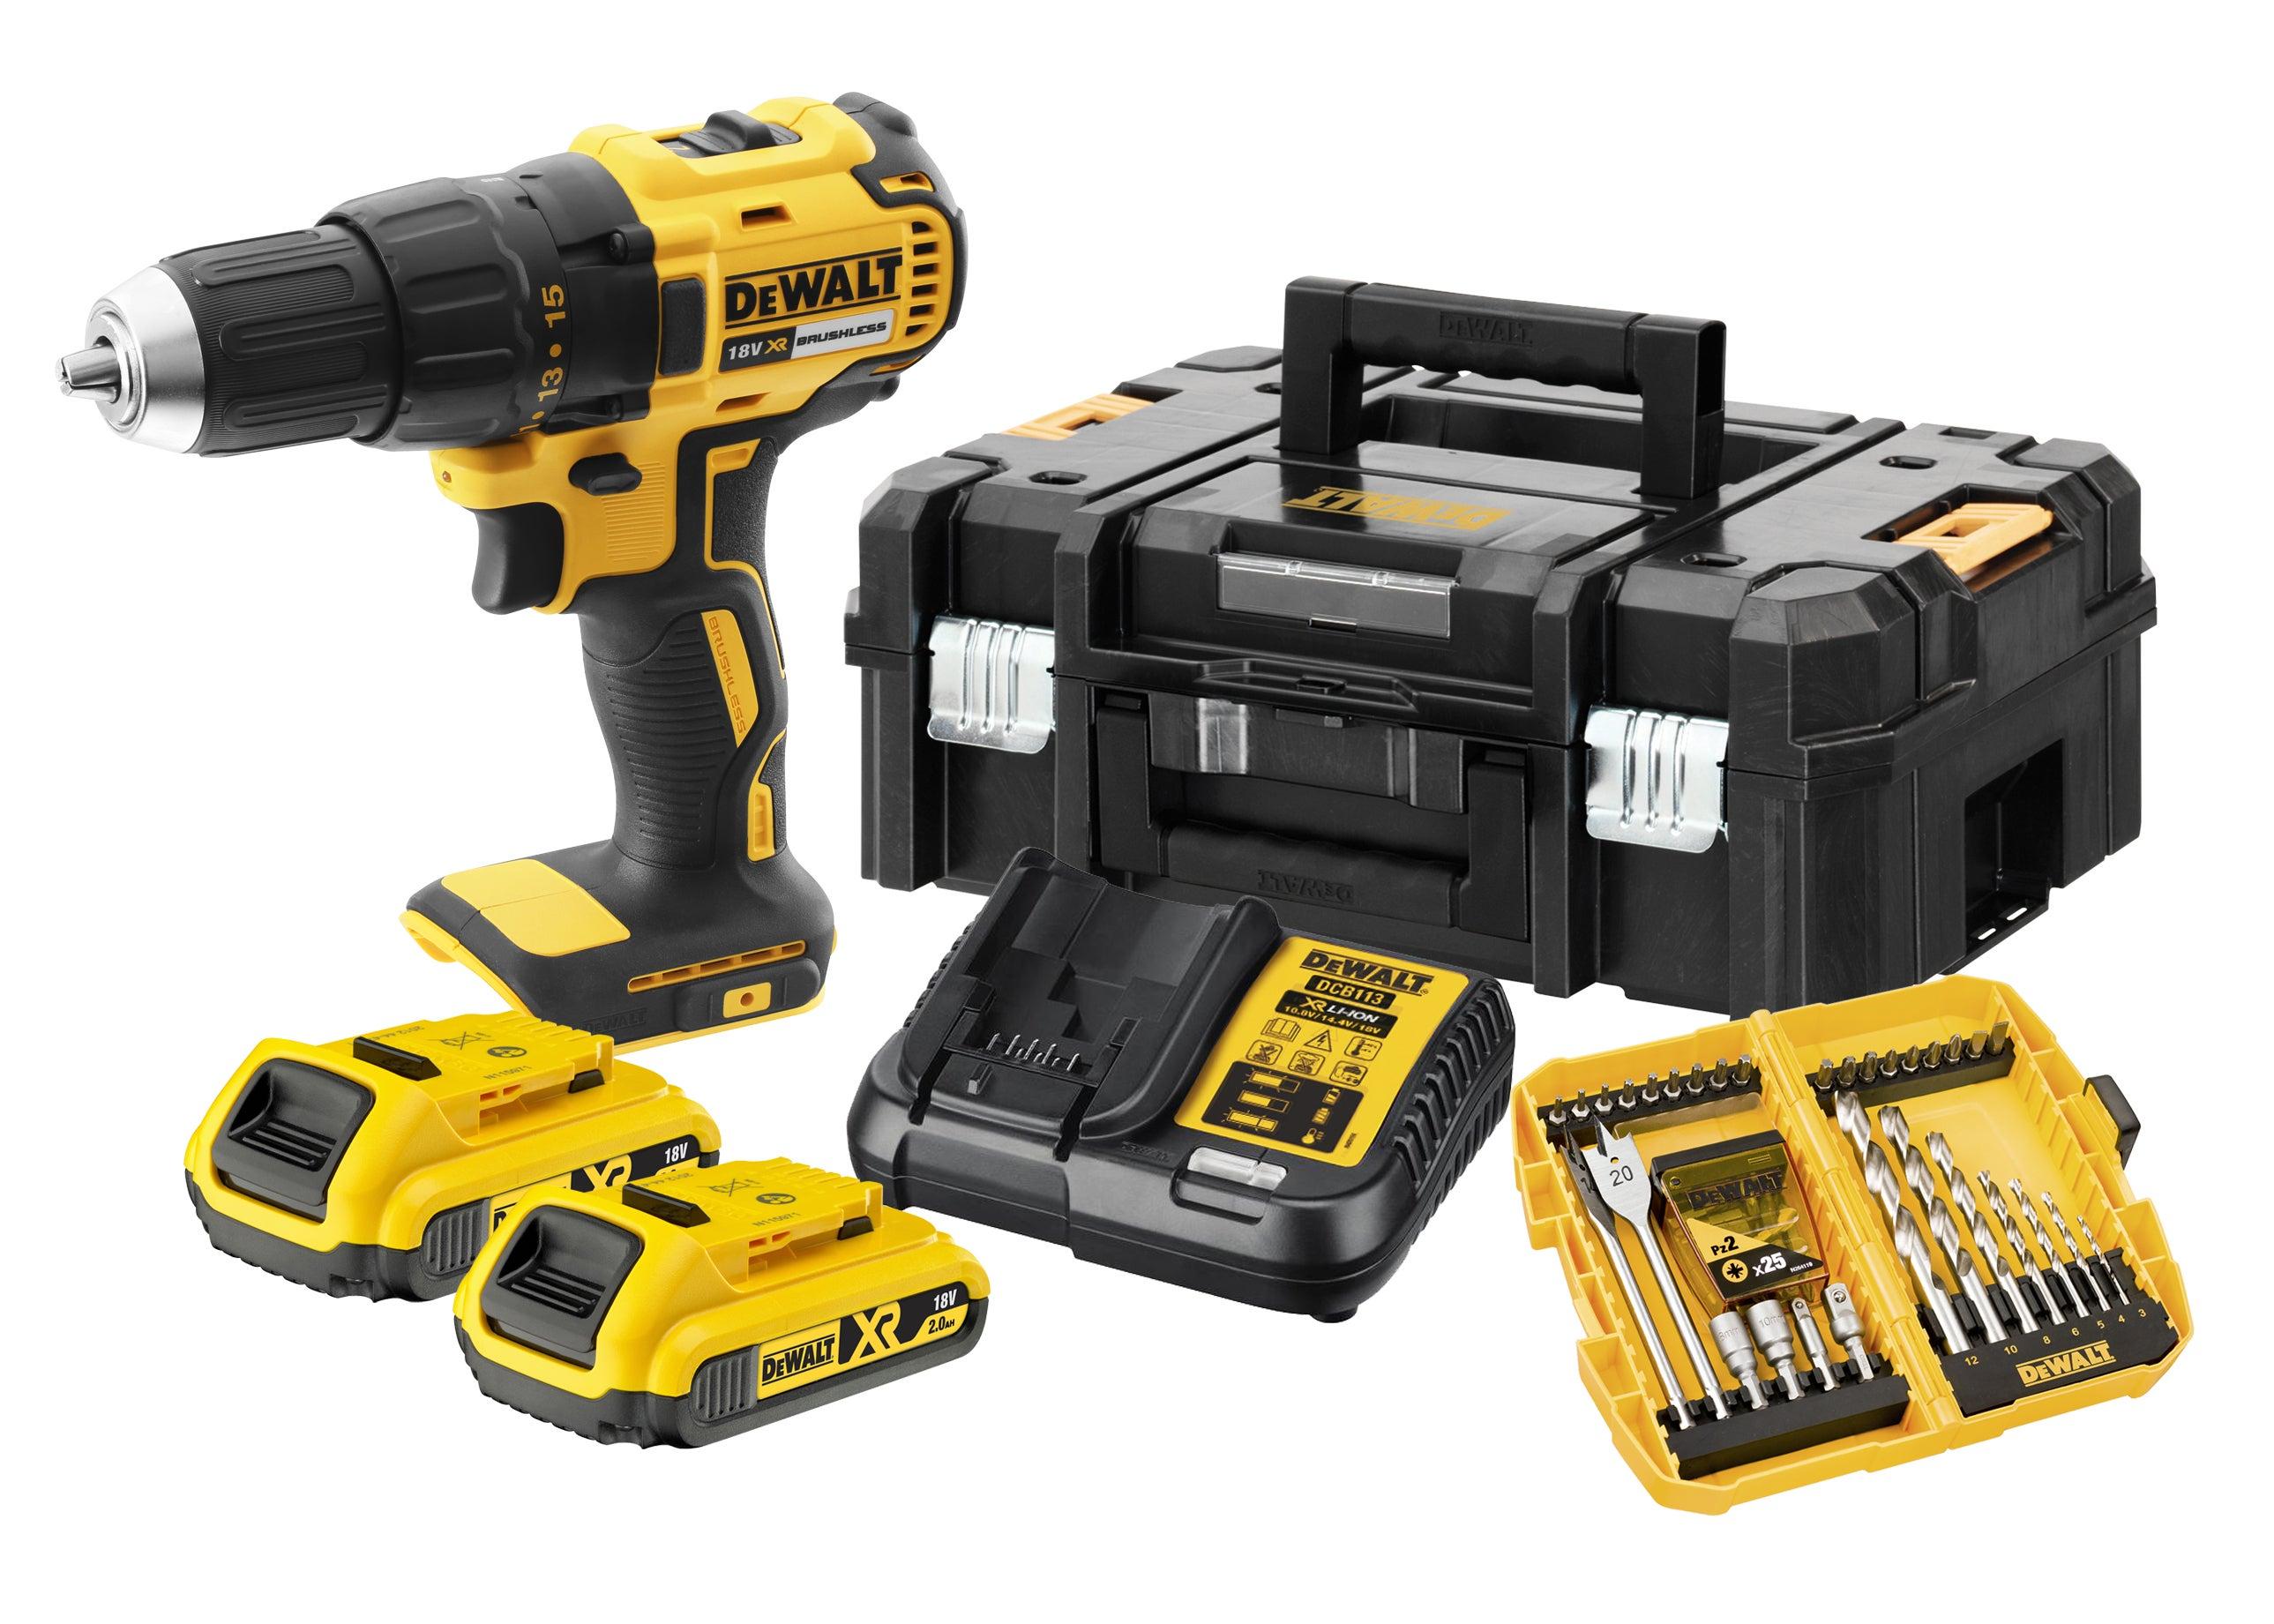 Perceuse sans fil DEWALT, 18 V 2 Ah, 2 batteries DCE777D2K + 56 accessoires